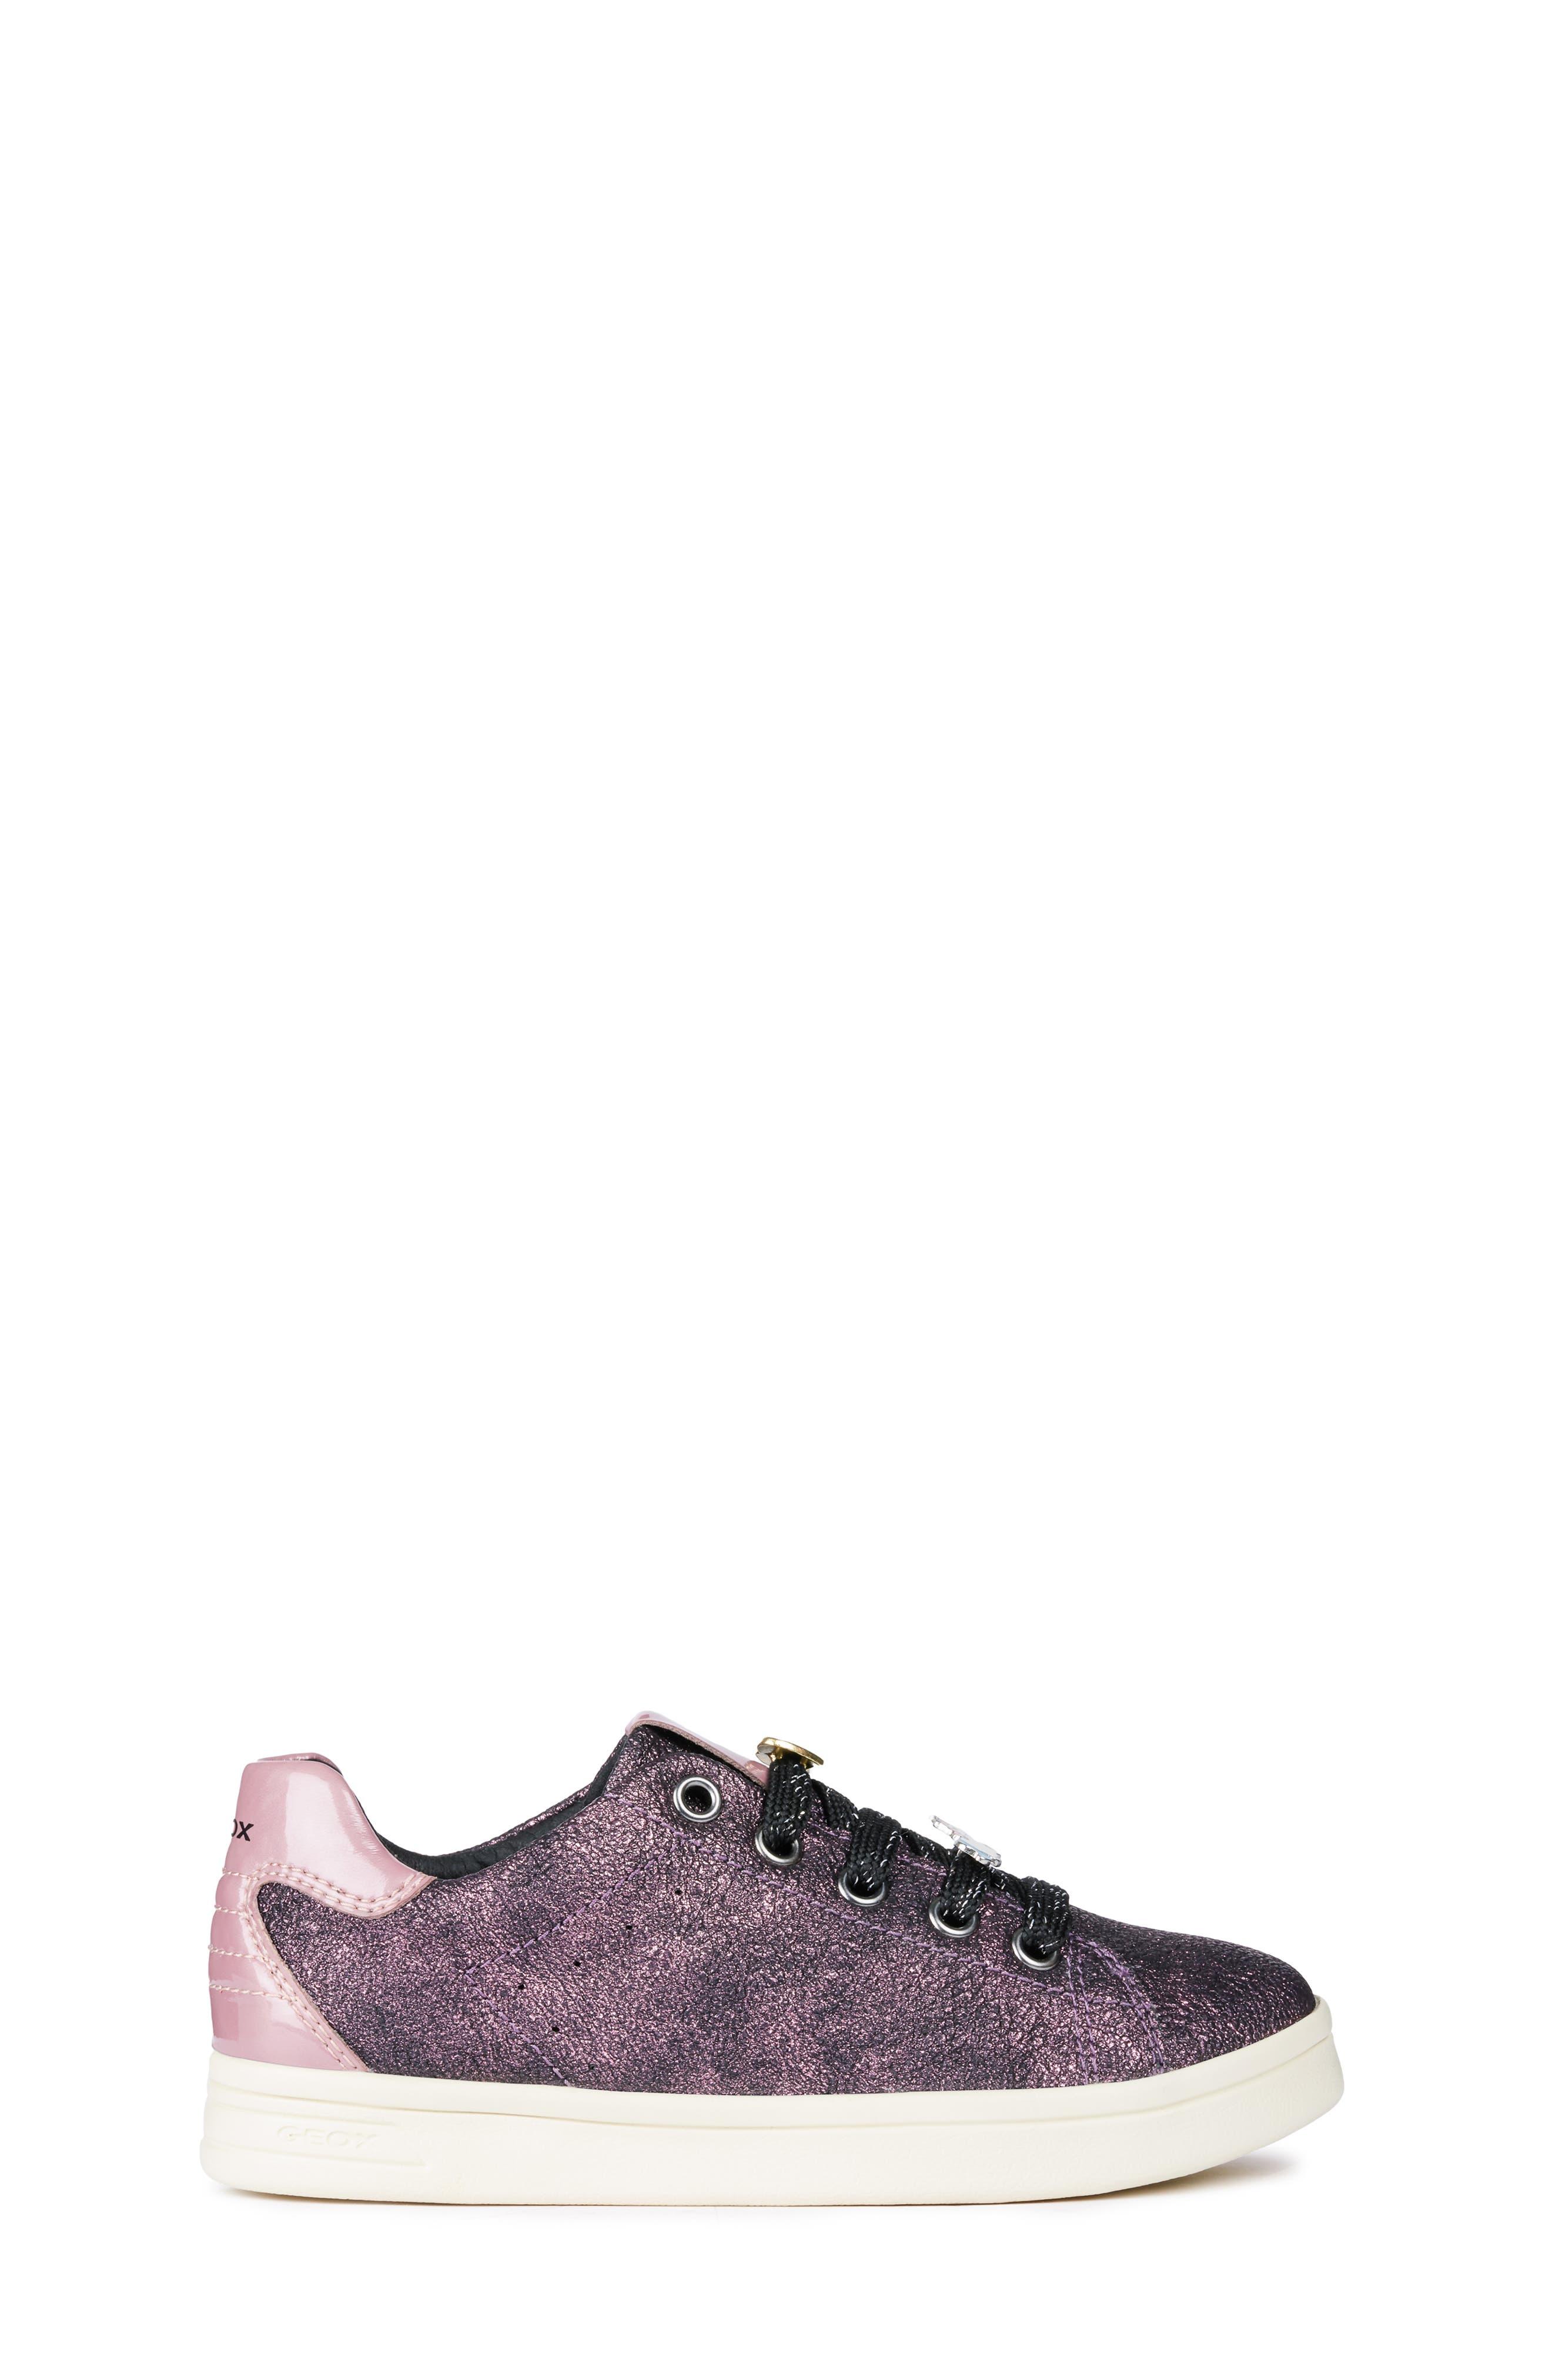 GEOX, DJ Rock Metallic Sneaker, Alternate thumbnail 3, color, DARK ROSE